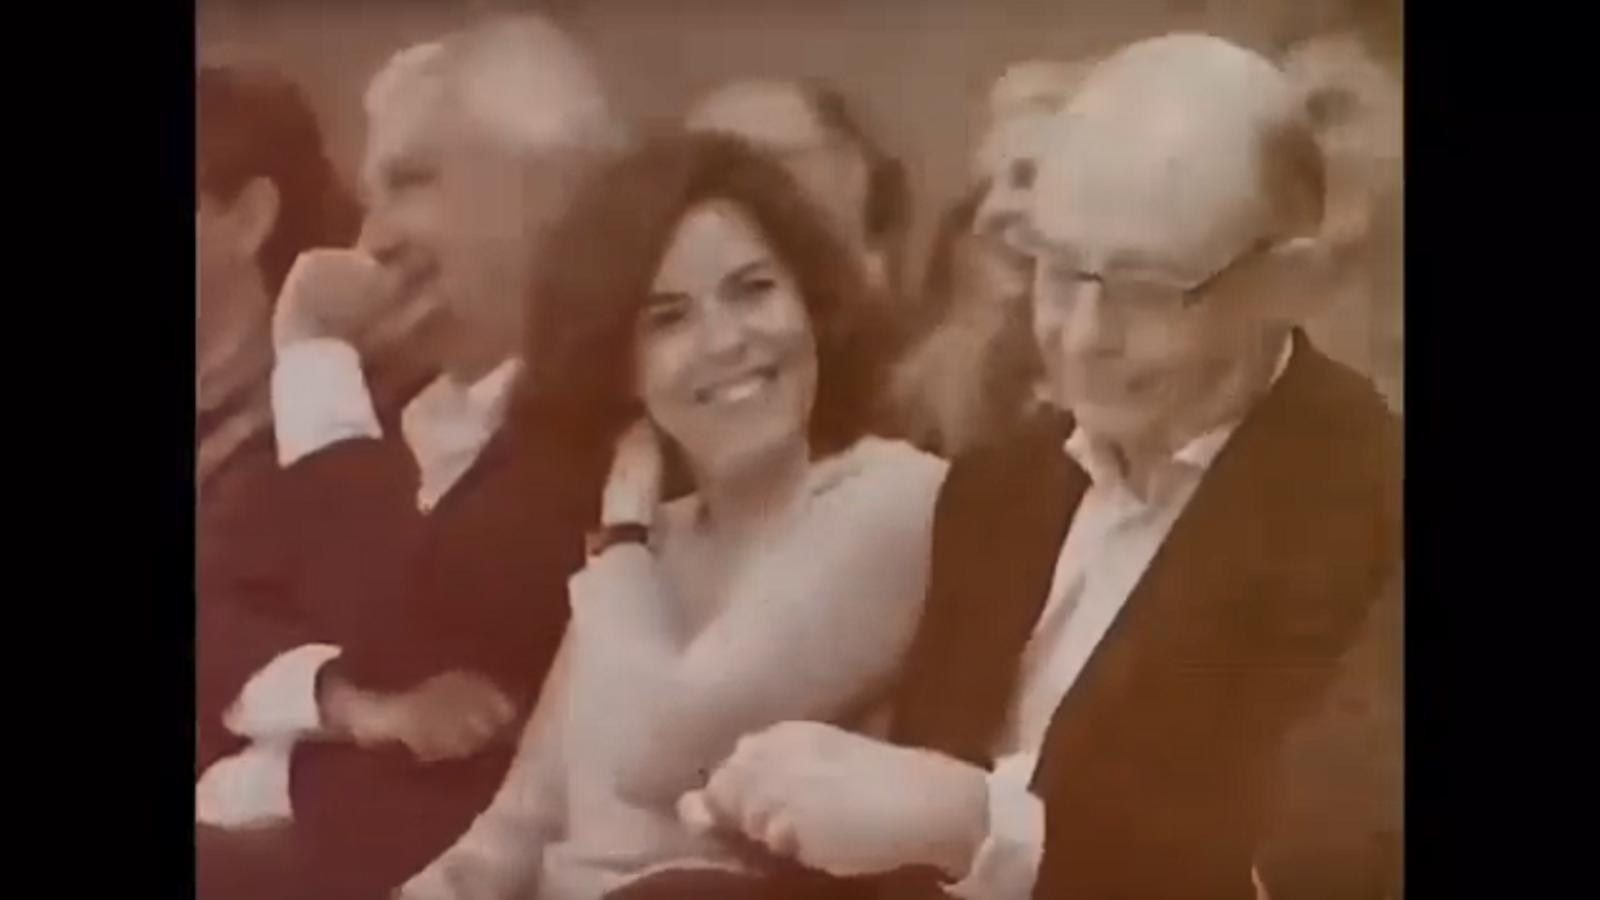 El polèmic vídeo de les primàries del PP contra Soraya Saénz de Santamaría